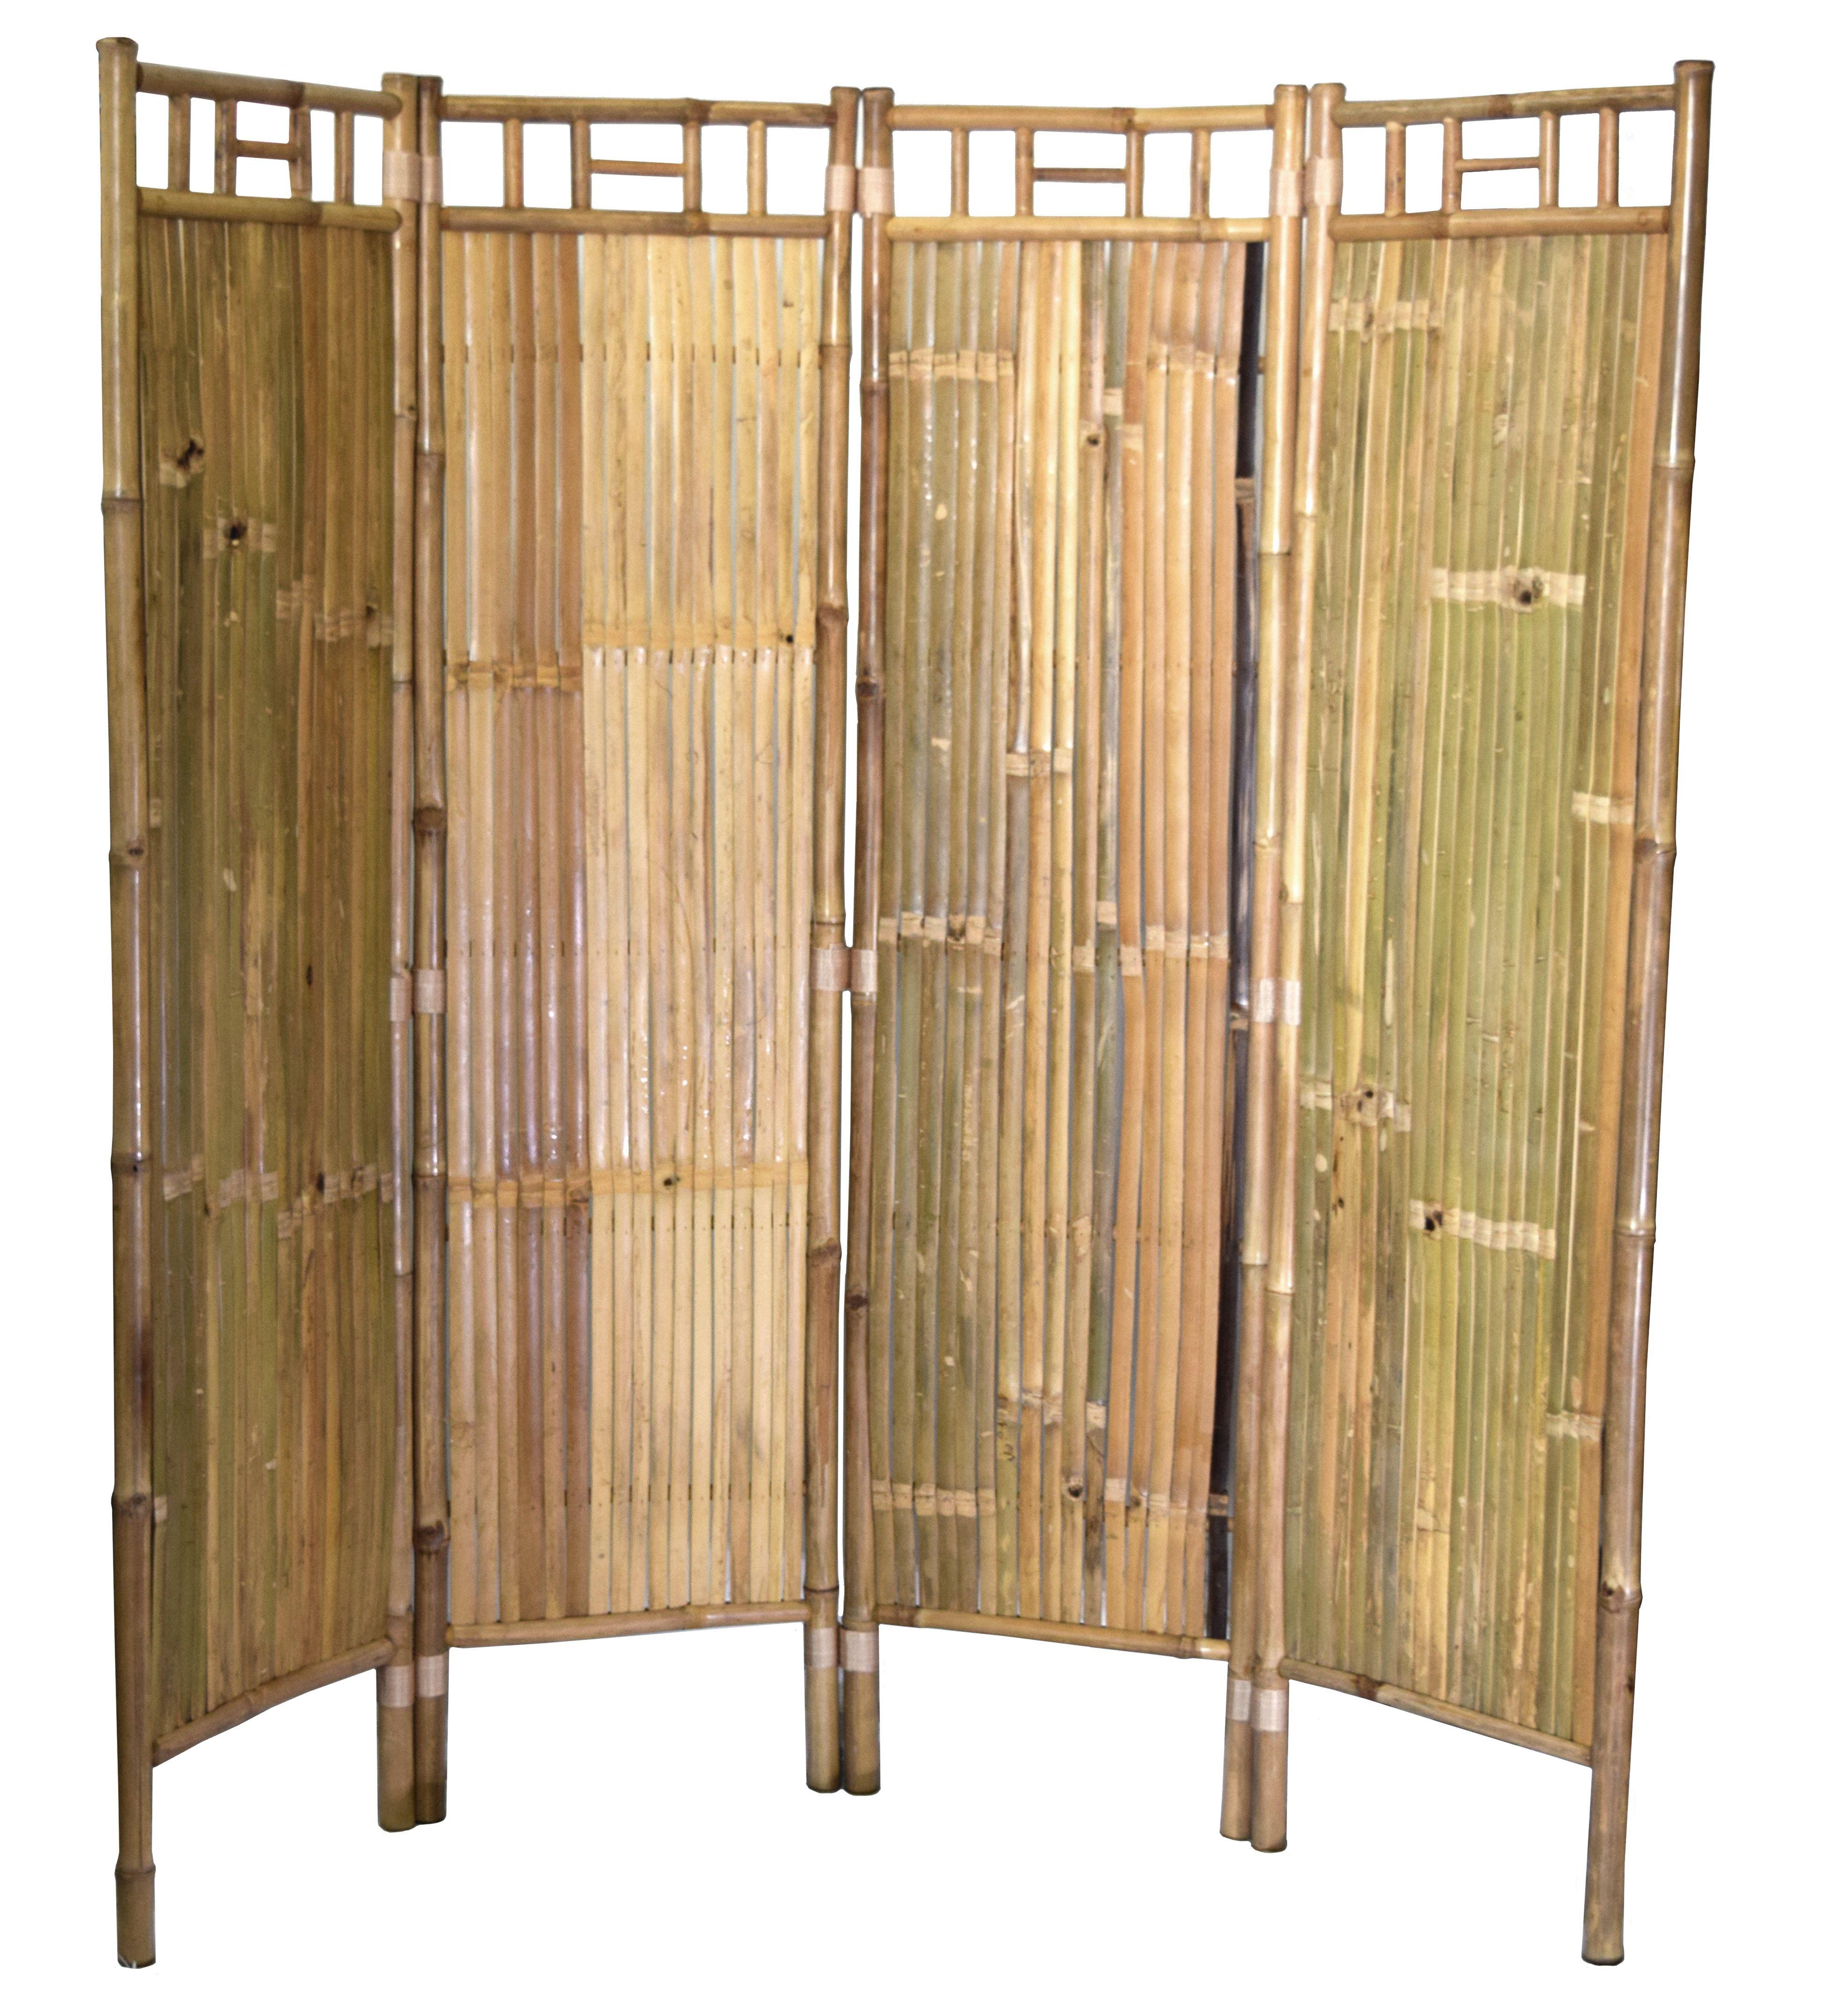 Bamboo54 5301A Bamboo 4 Panel Screen